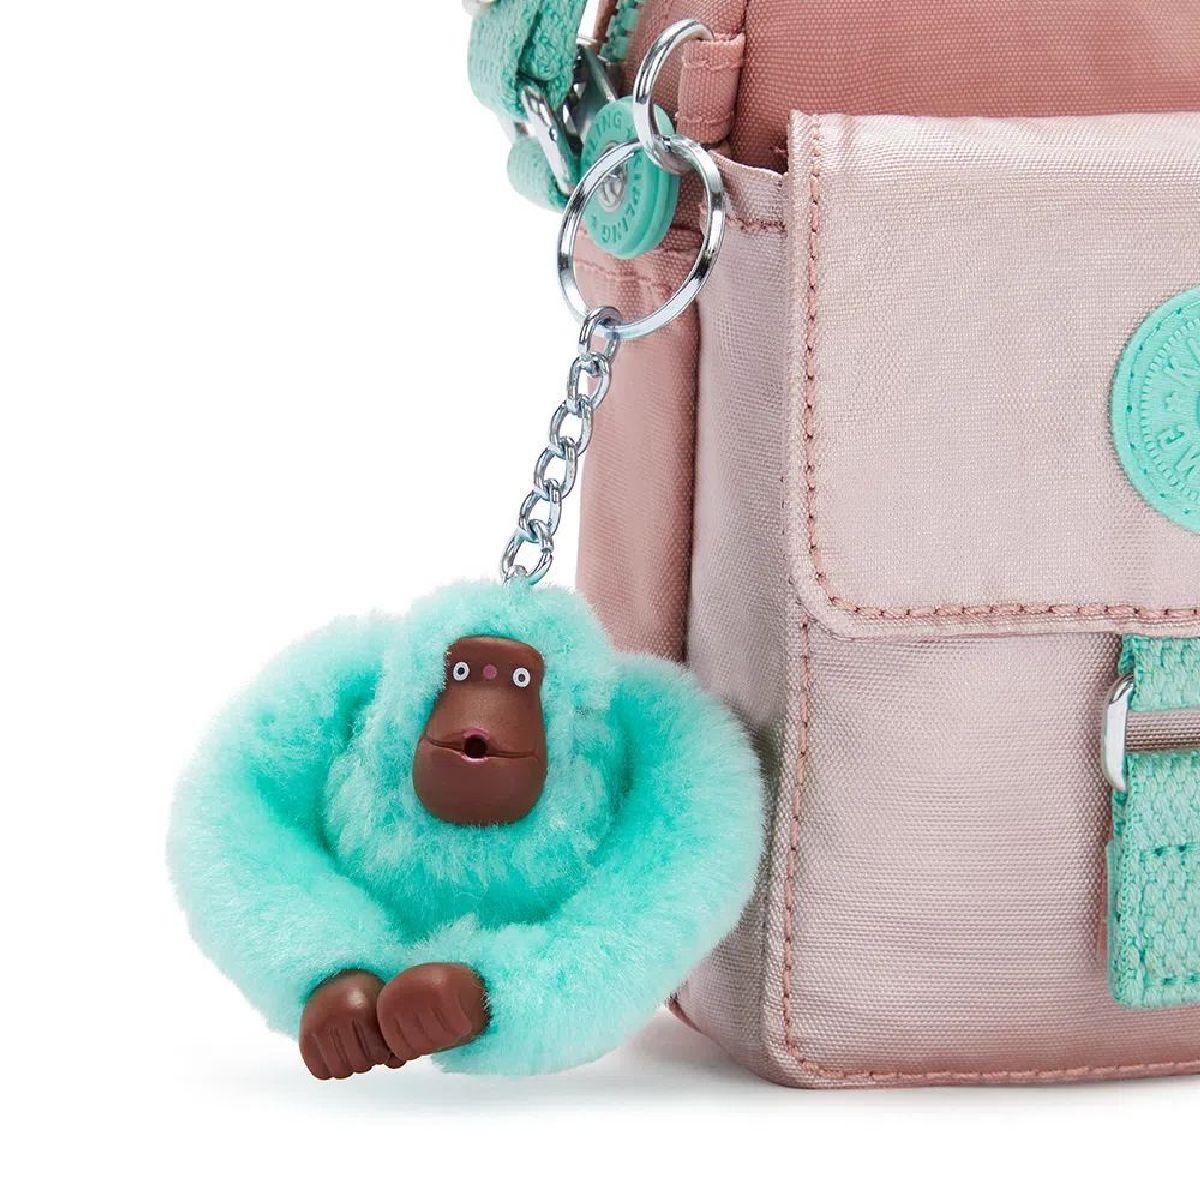 Bolsa Pequena Transversal Teddy Kipling Cotton Candy Bl